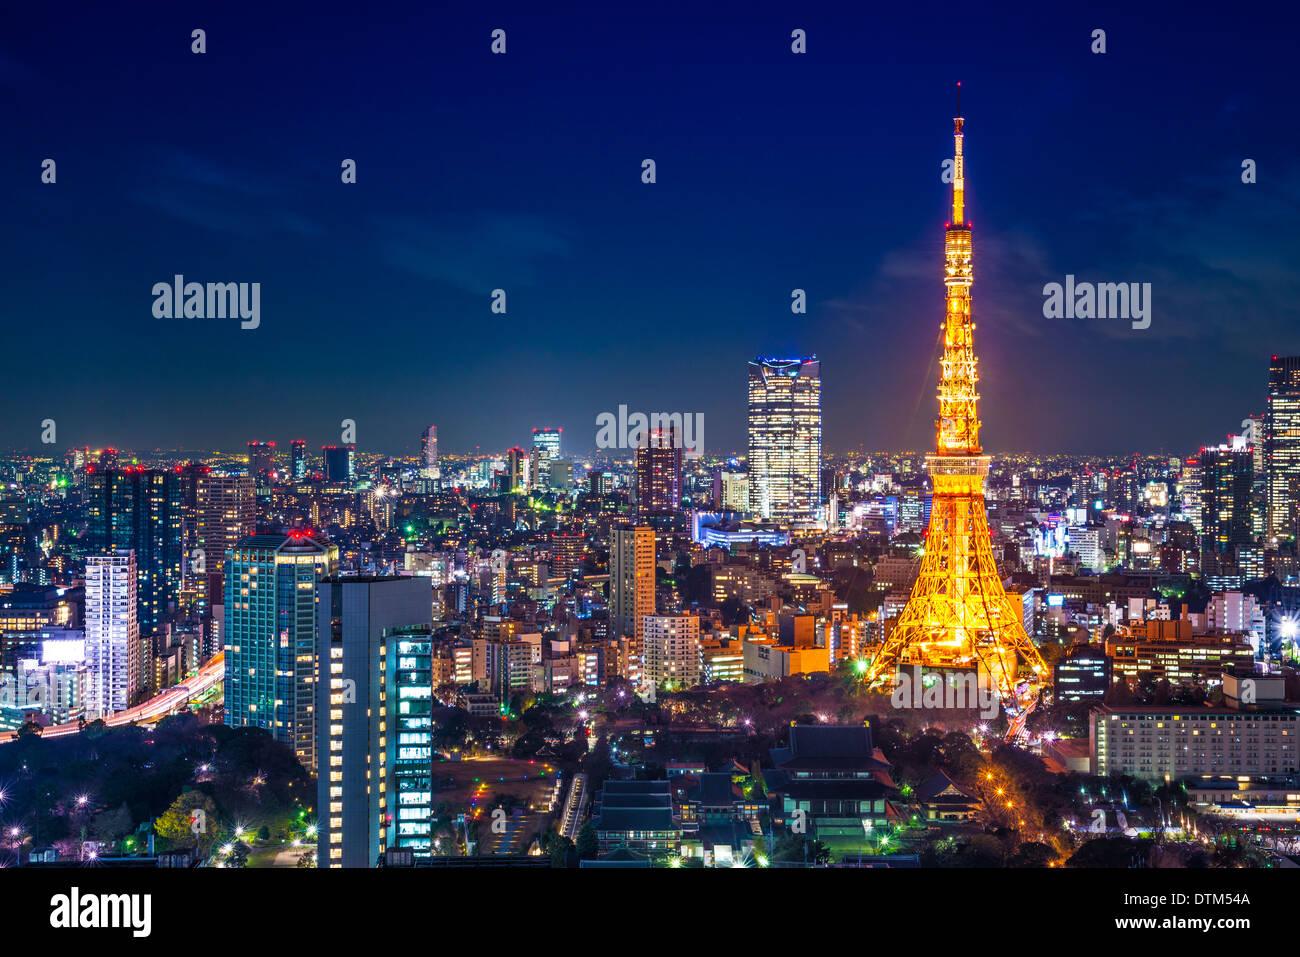 Tokyo, Japan Stadtbild Antenne Stadtbild Ansicht bei Nacht. Stockbild